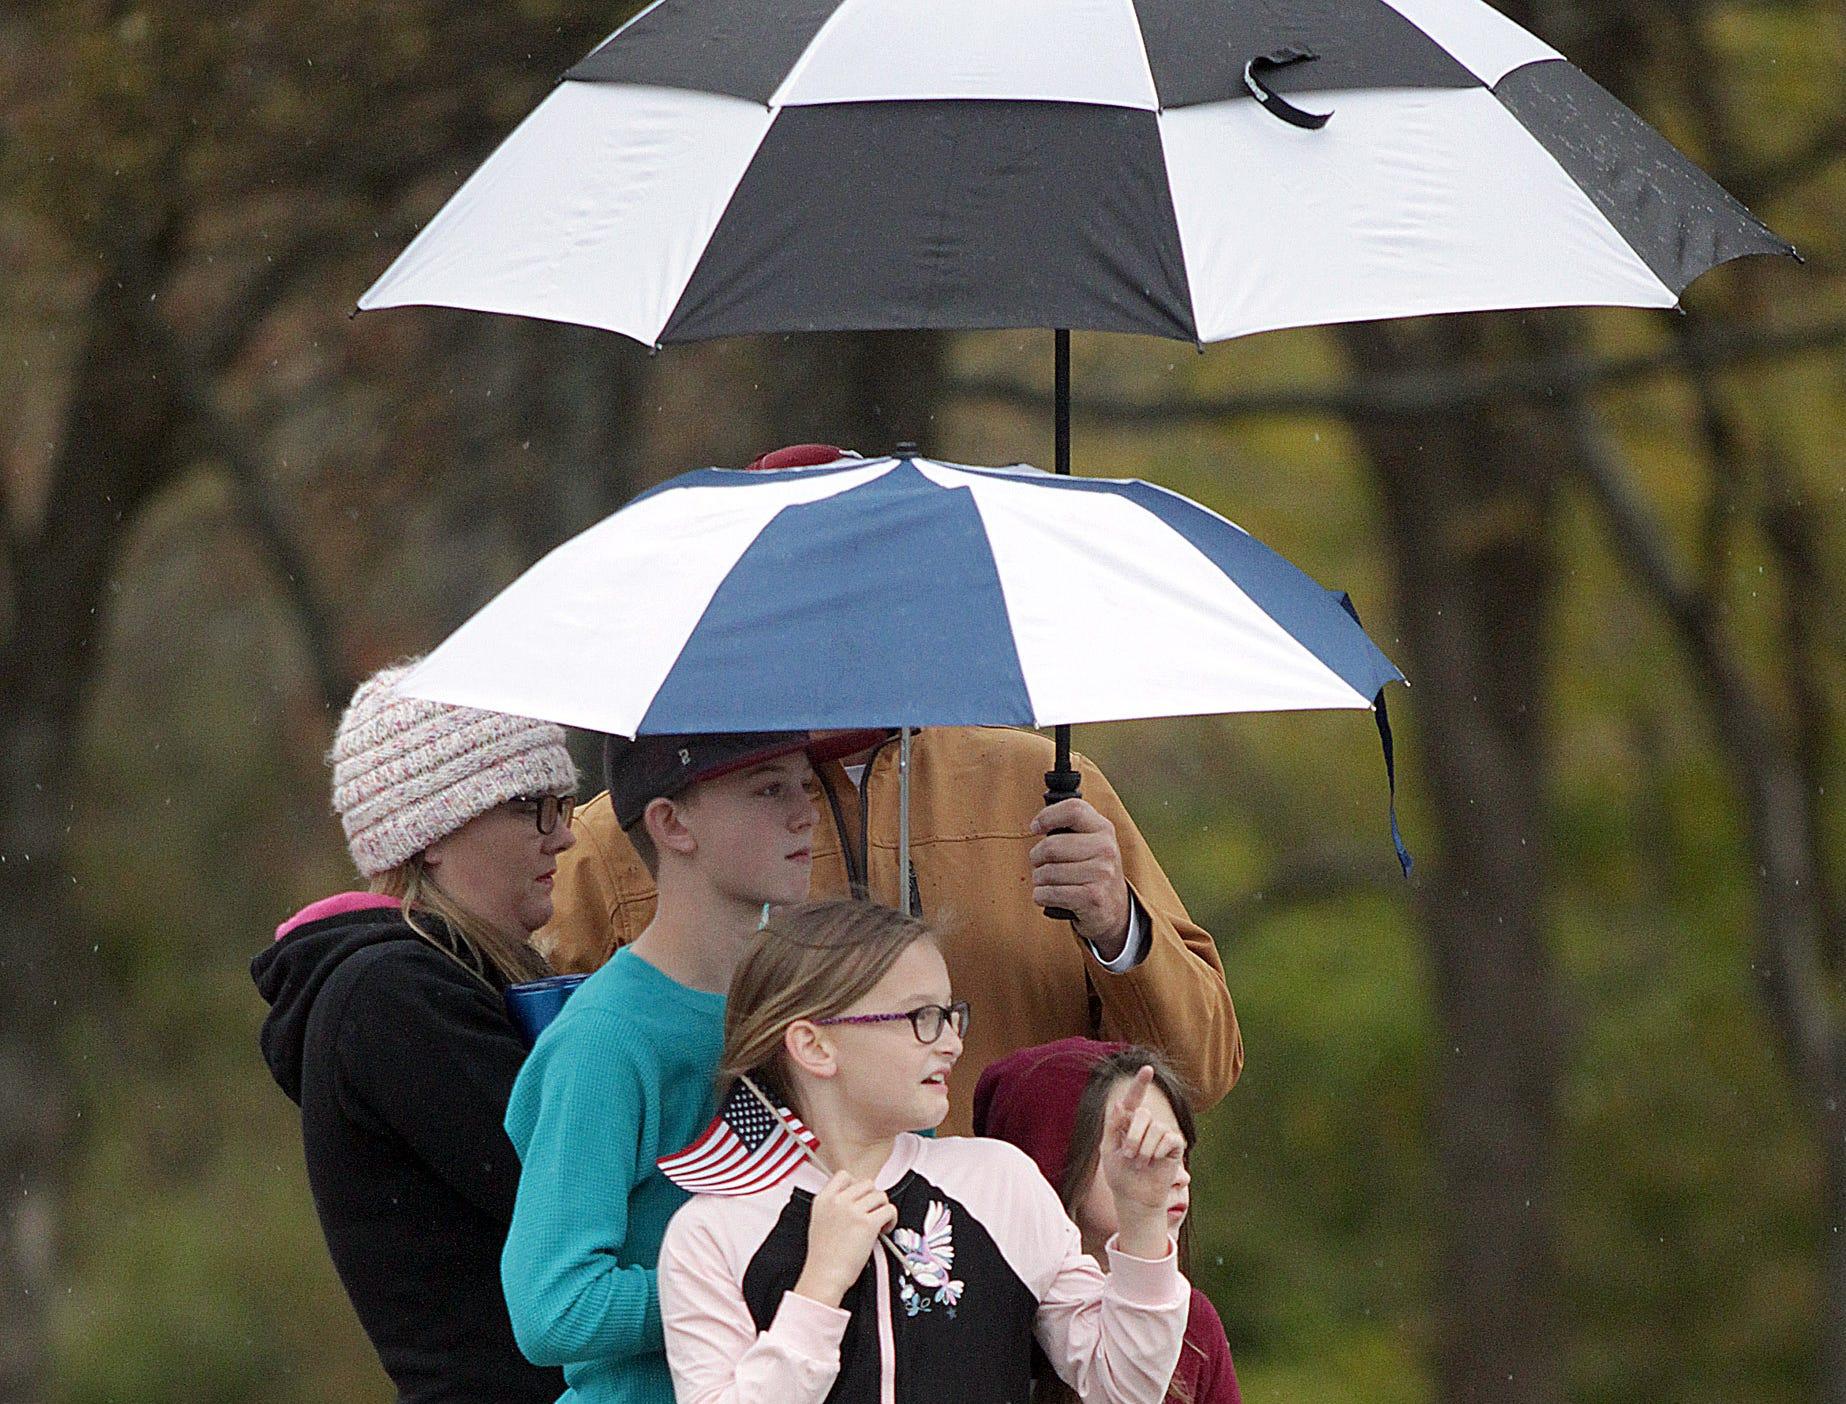 Folks brave the rain to watch the Veterans Day Parade in Henderonville, TN on Sunday, November 4, 2018.